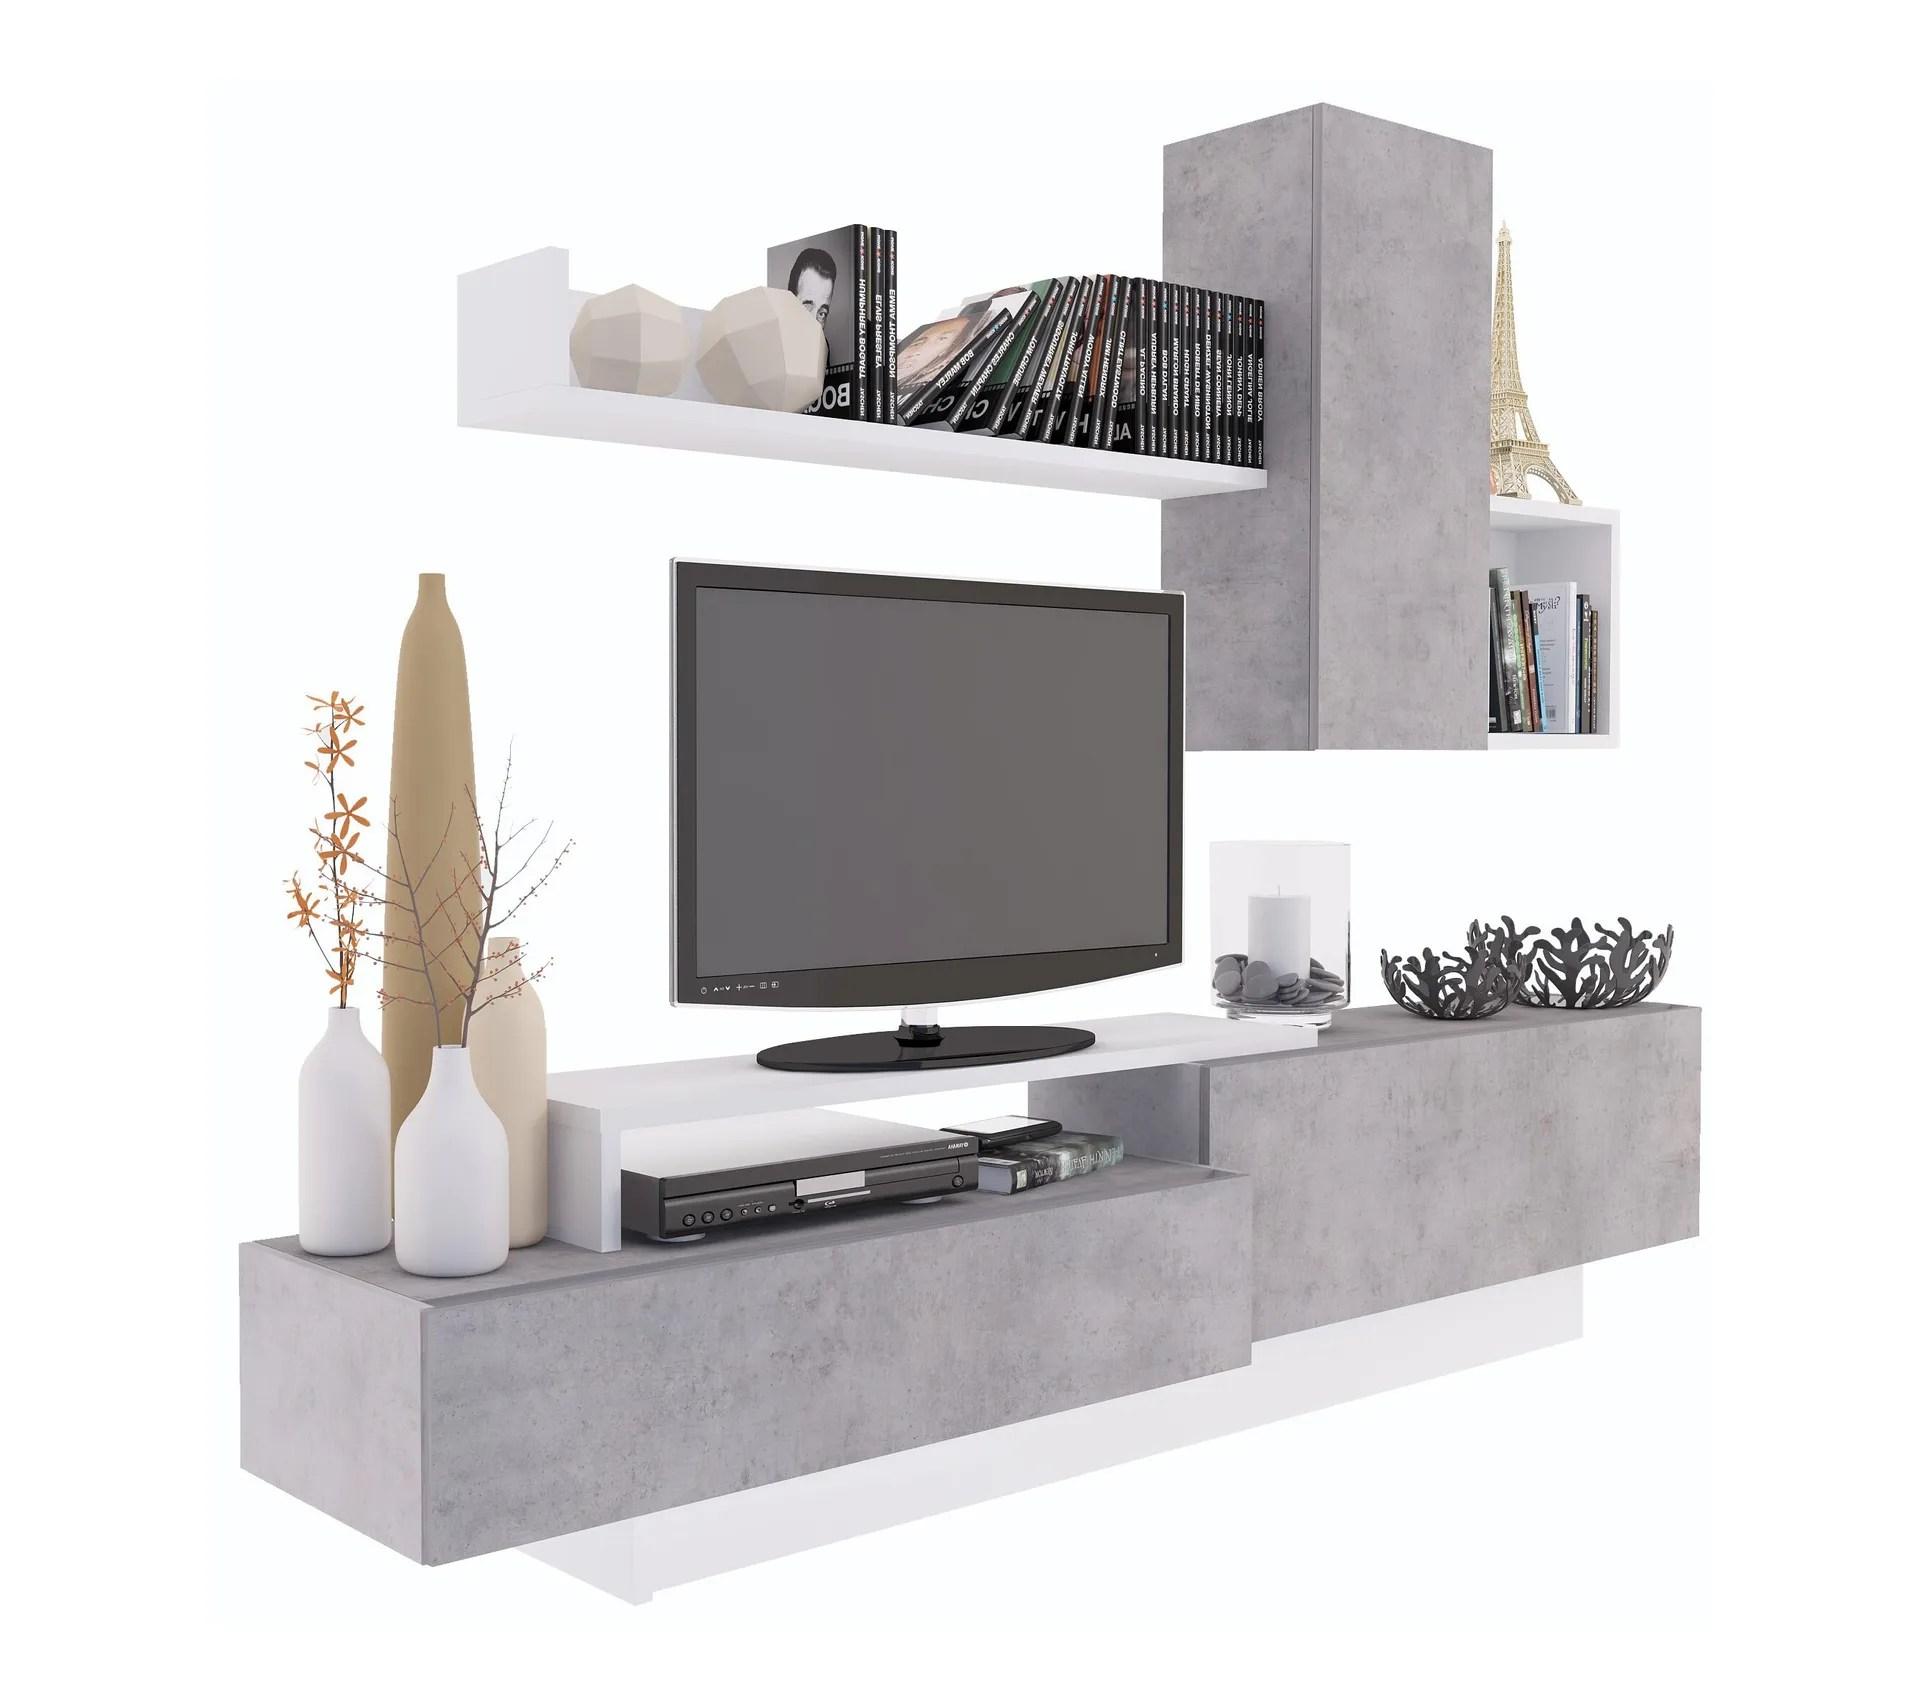 meuble tv kastle imitation beton et blanc